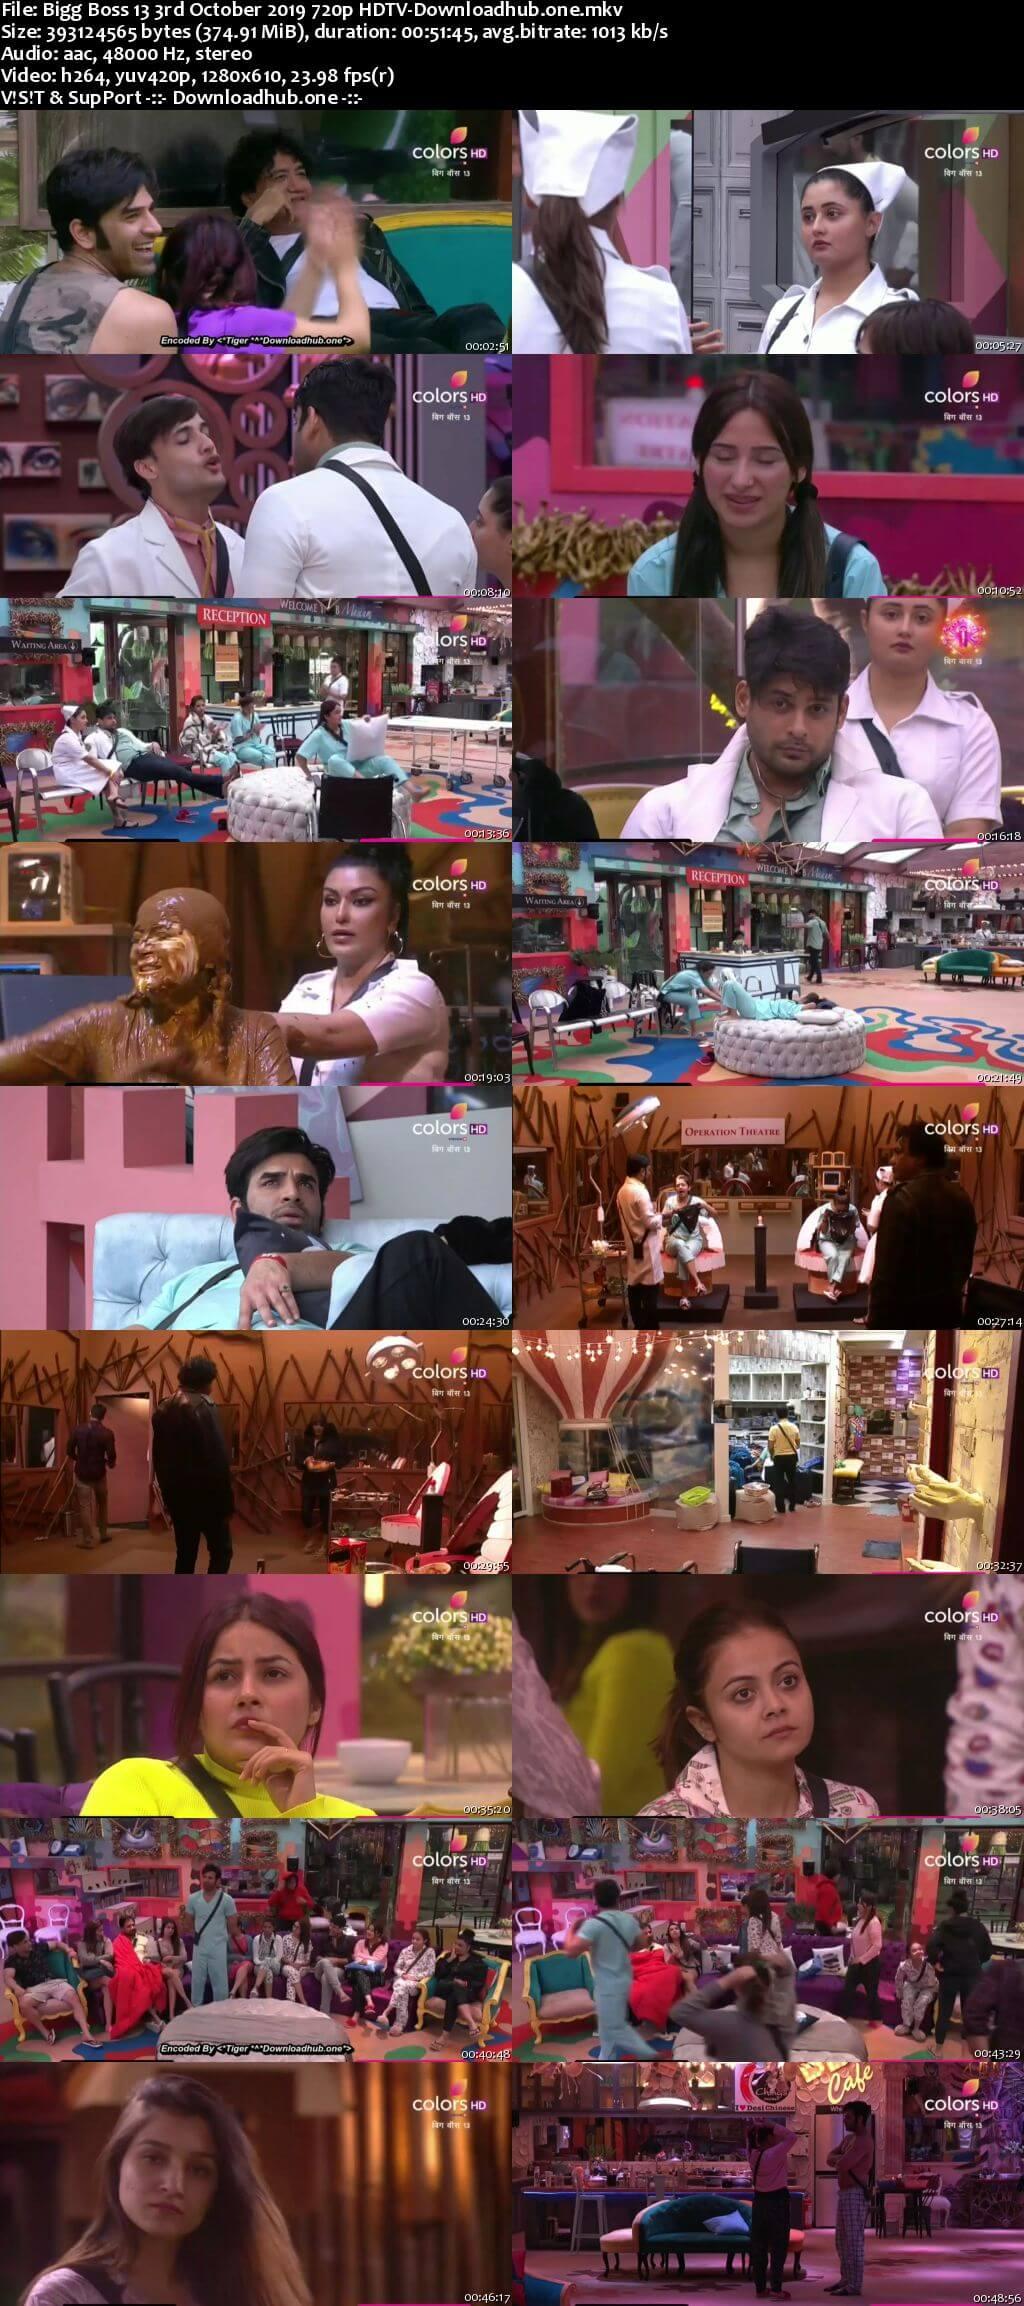 Bigg Boss 13 03 October 2019 Episode 04 HDTV 720p 480p